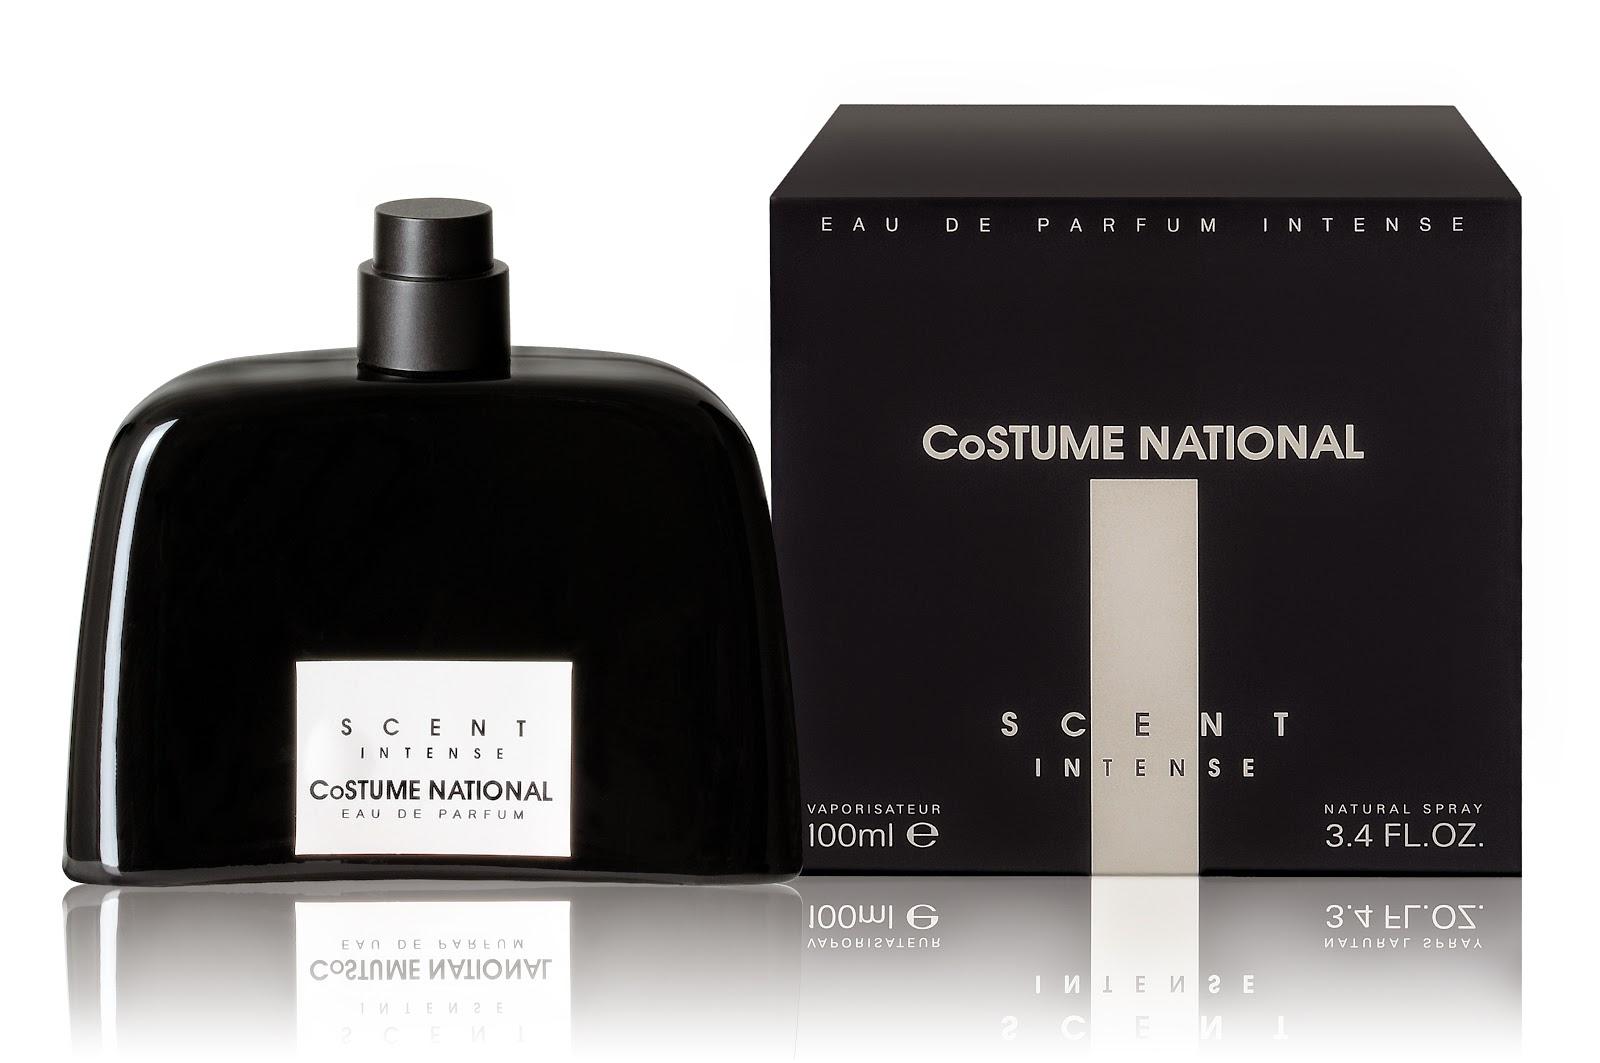 koku-cazibe-özgüven-parfüm